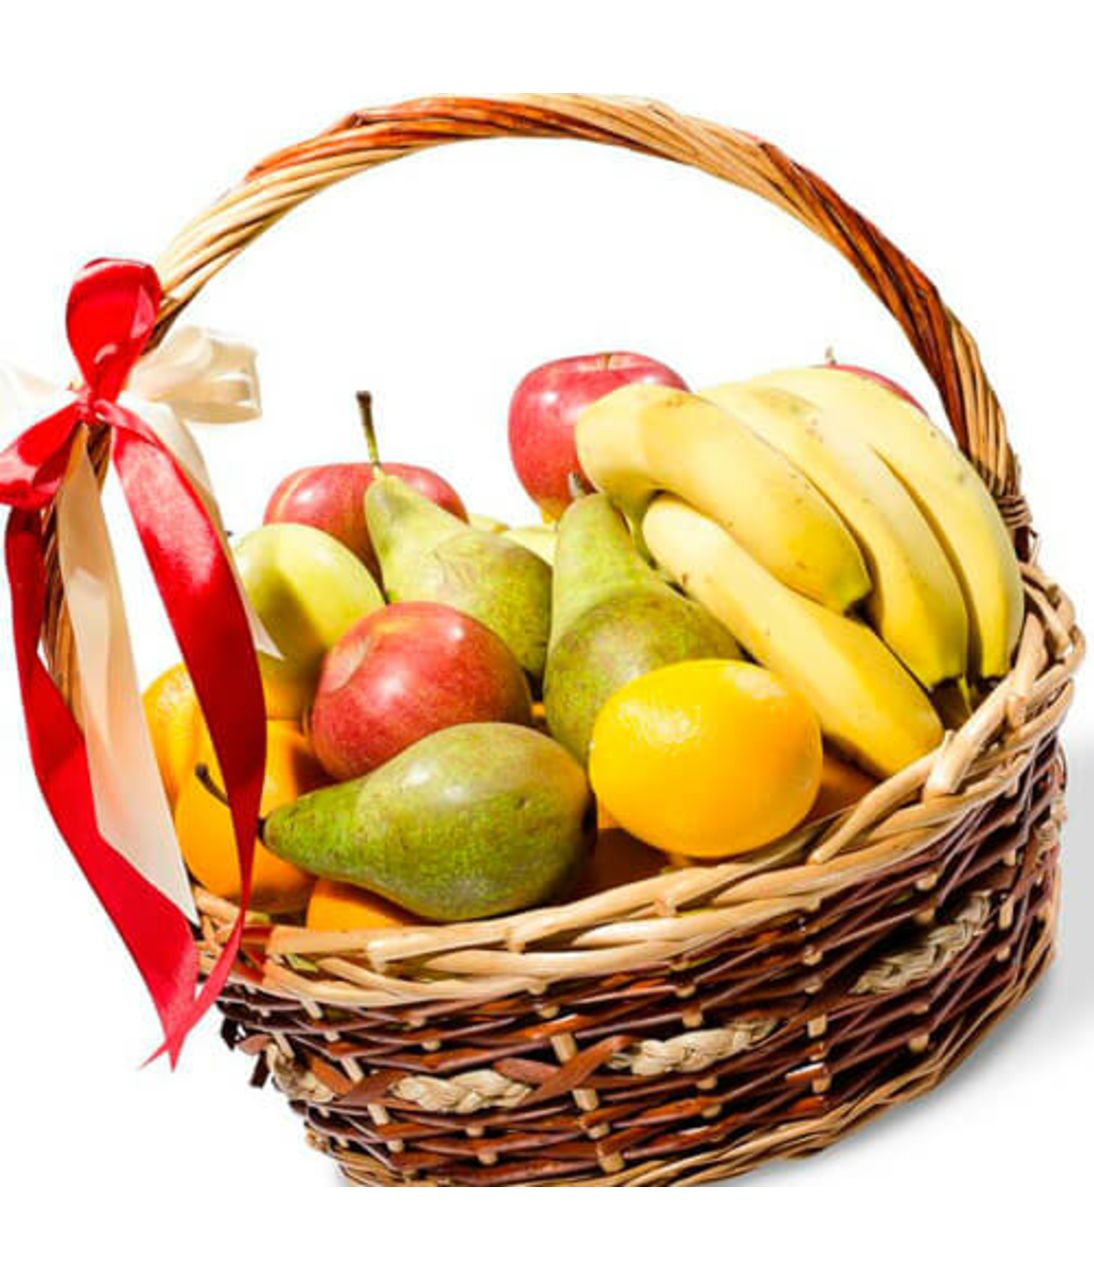 Подарункова корзина з фруктами. Superflowers.com.ua.